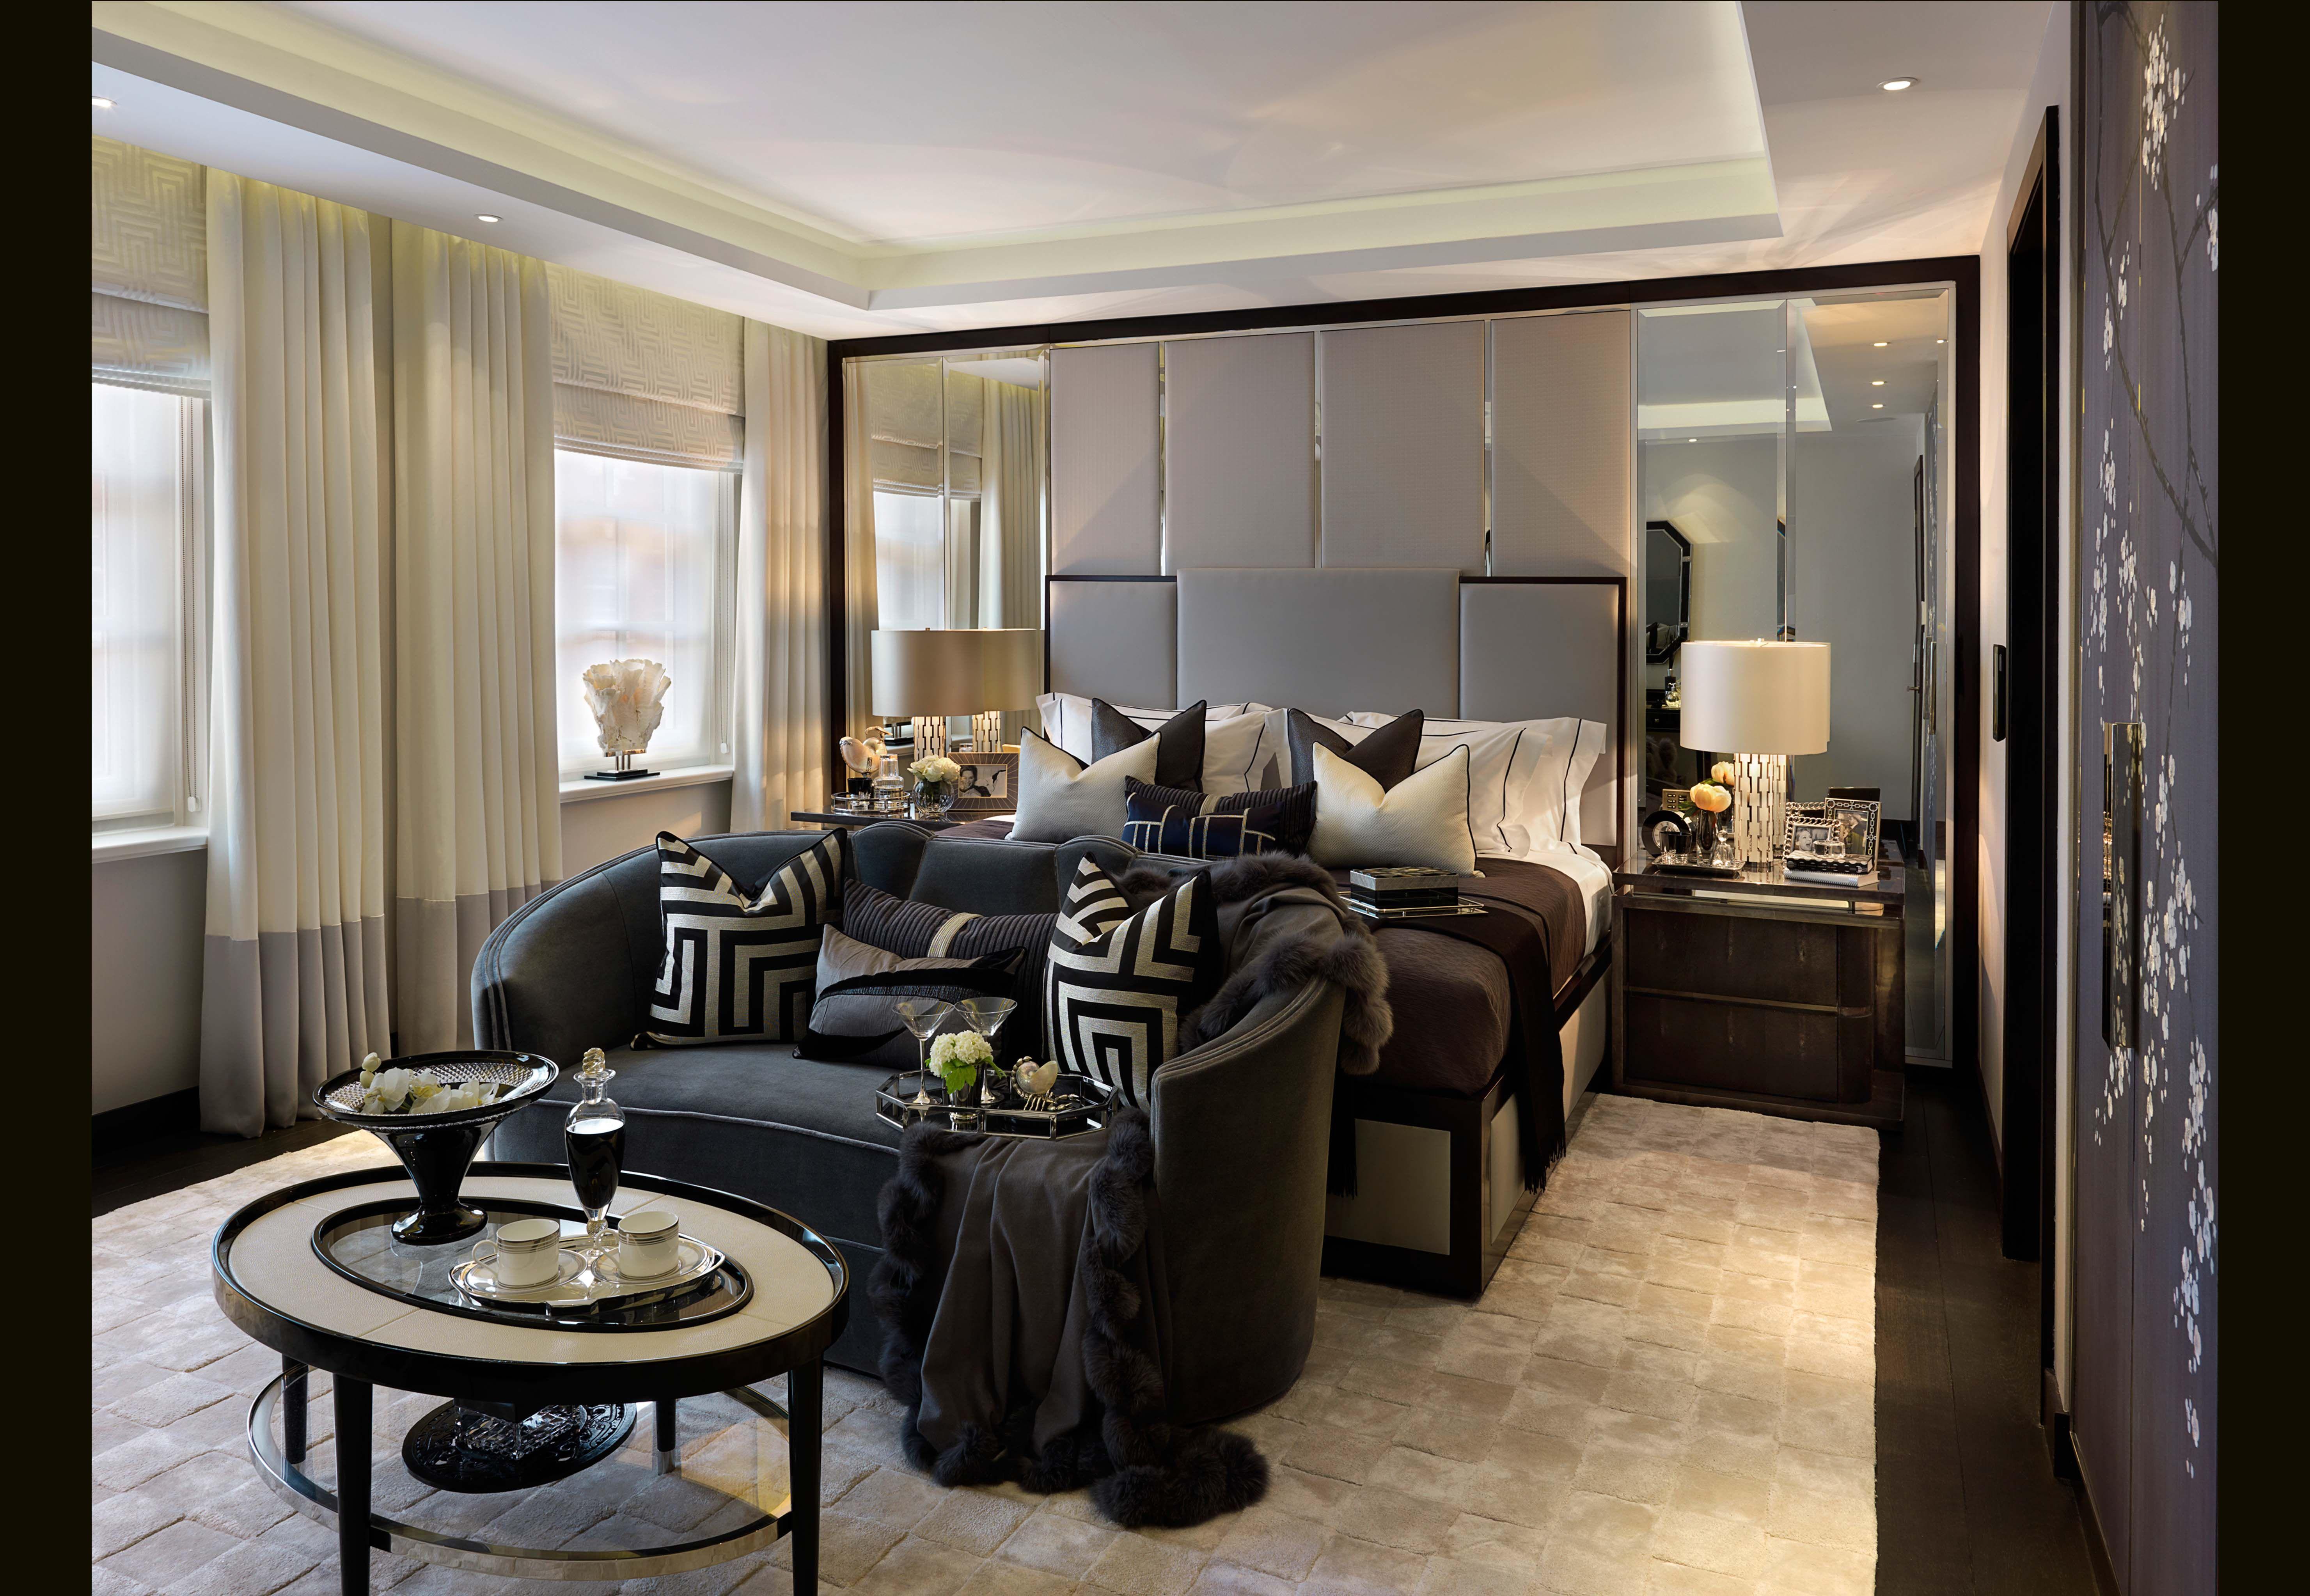 Interior designers in london katharine pooley luxury for Design companies london